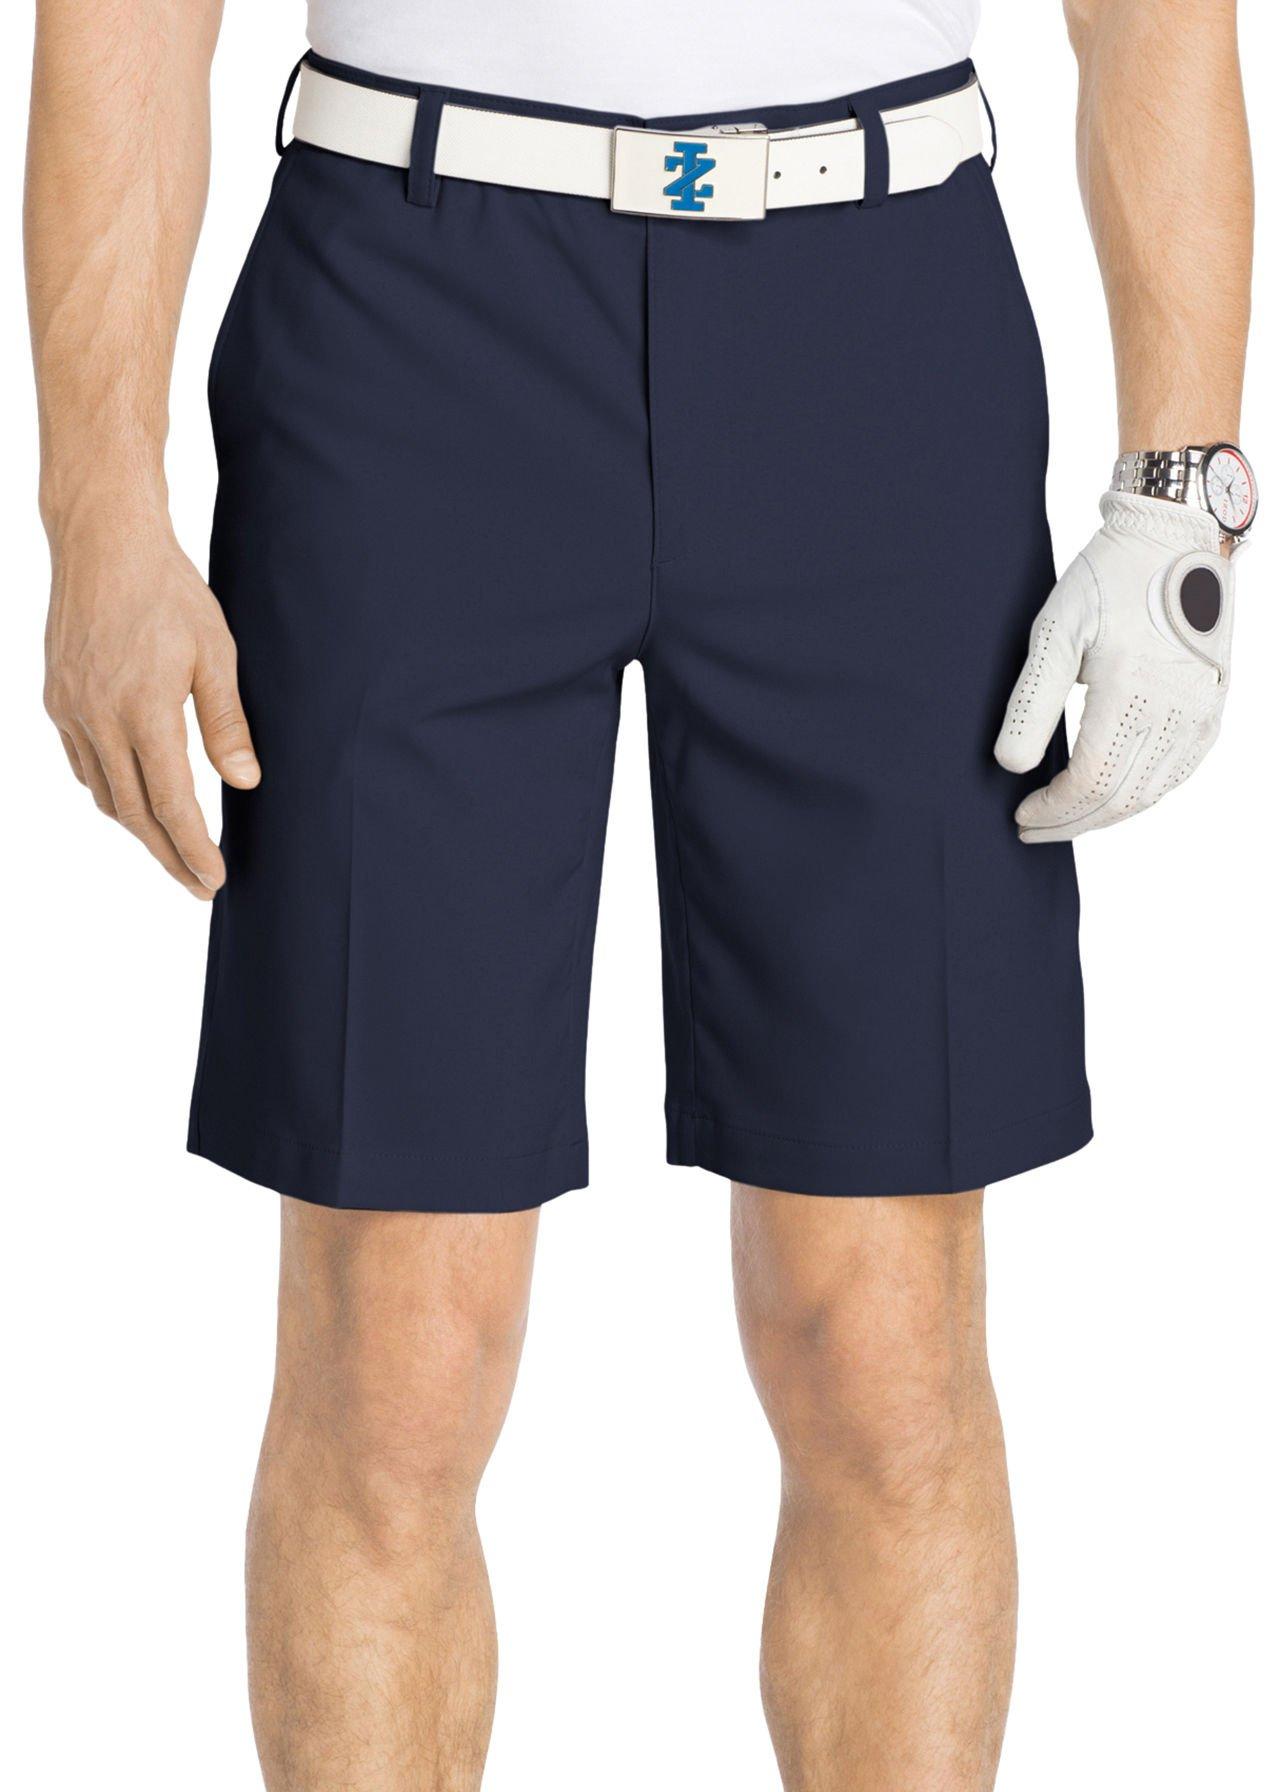 IZOD Golf Mens Micro Fit Flex Golf Shorts 42W Peacoat blue by IZOD (Image #1)